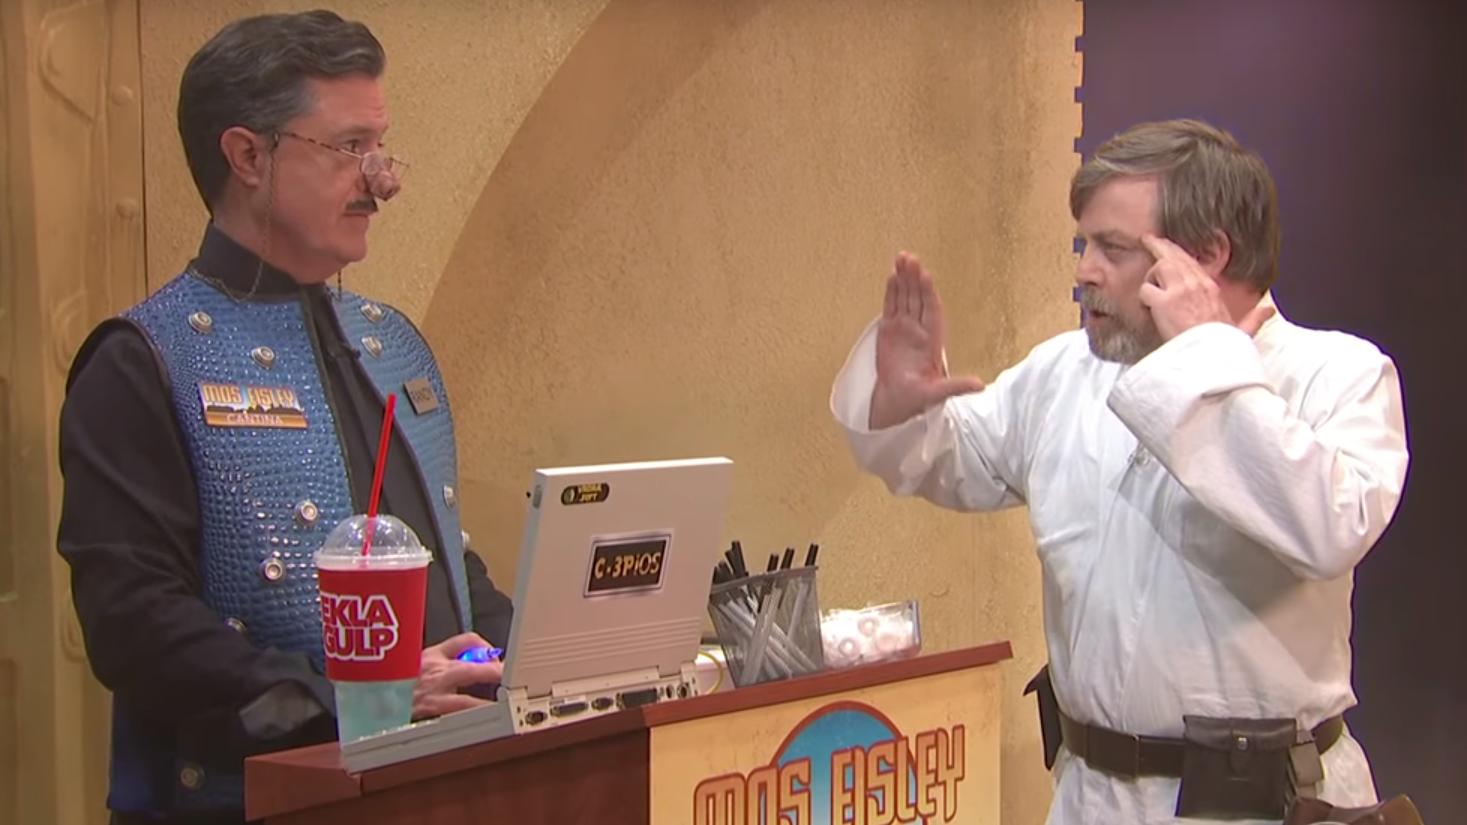 Stephen Colbert, Mark Hamill perform new 'Star Wars' Cantina scene